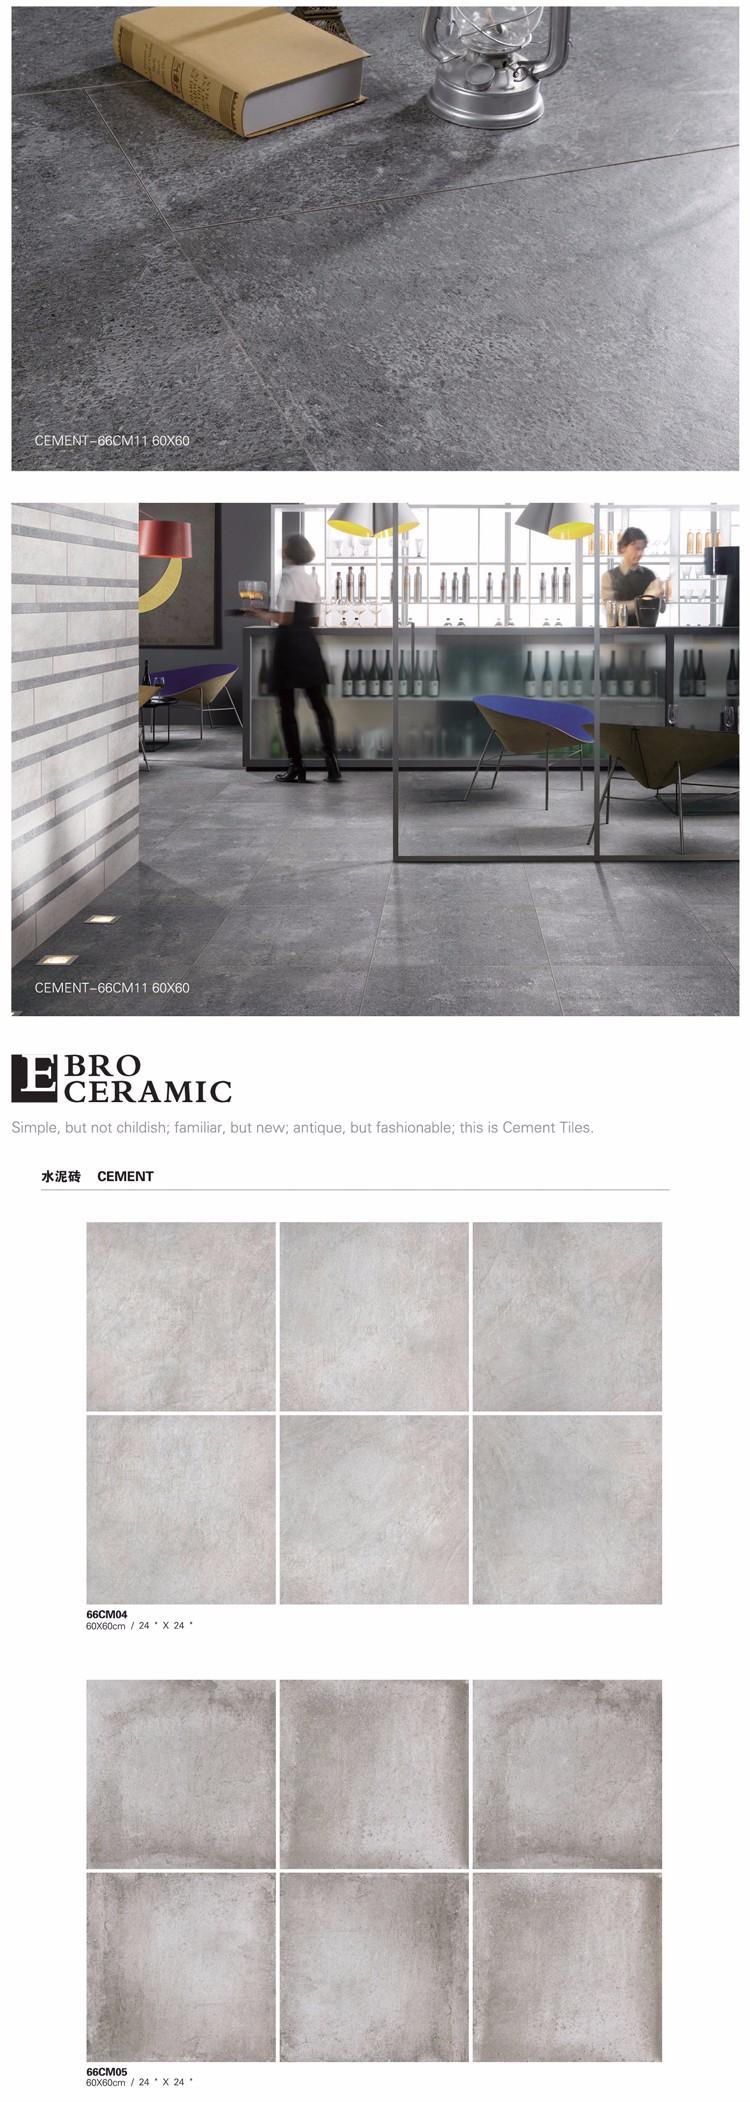 Newest Design Wholesale Price Top Quality Outdoor Plastic Floor Tile